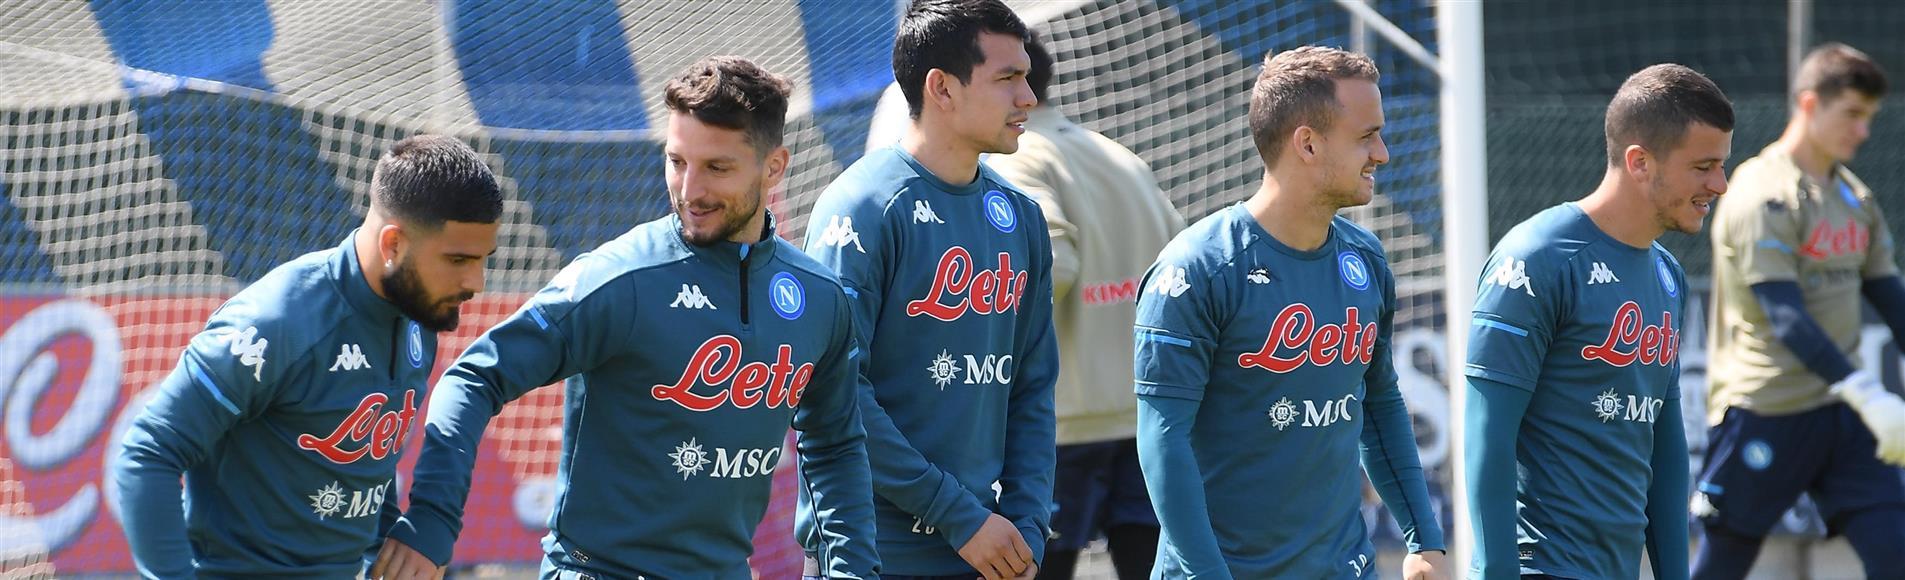 Napoli-Benevento, tutti i baby azzurri da tenere sott'occhio |  Sport e Vai